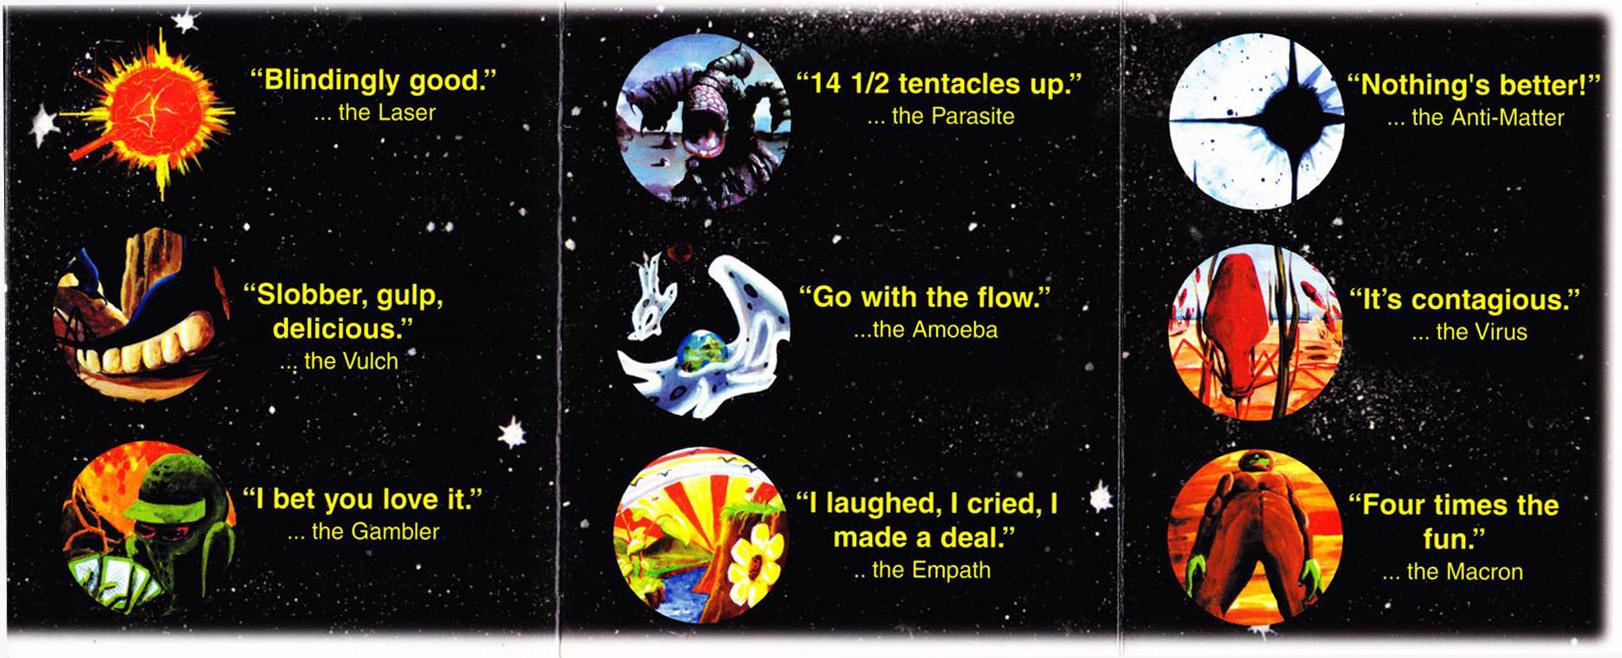 ceo-alien-quotes-flier.jpg